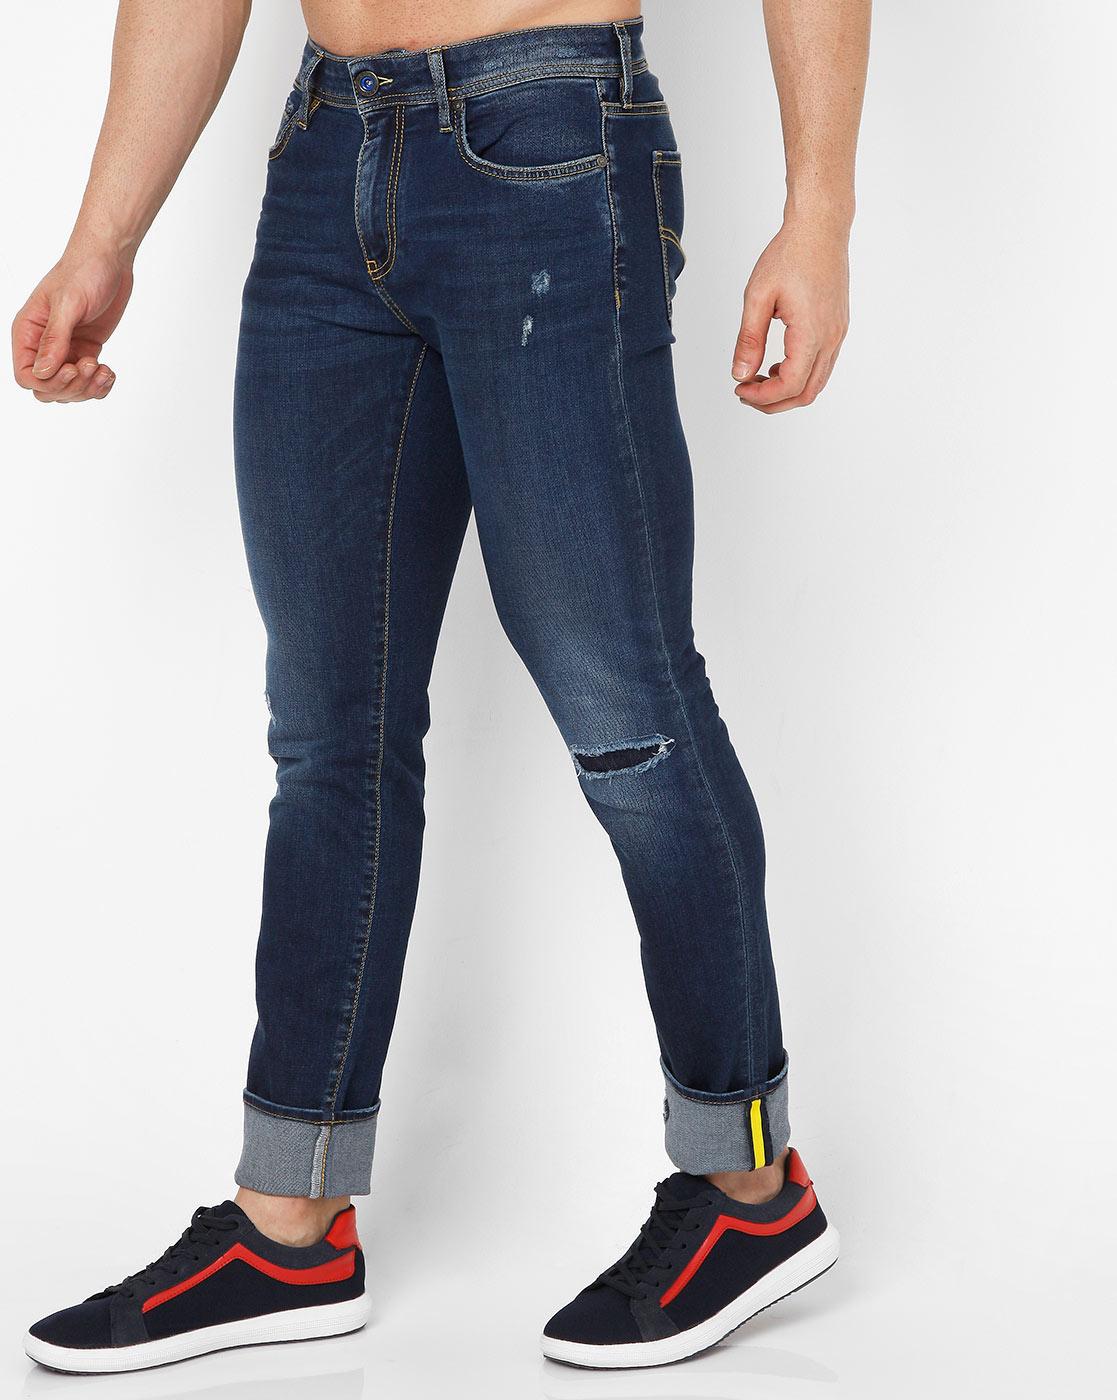 GAS | Men's Sax Zip Skinny Fit Blue Jeans